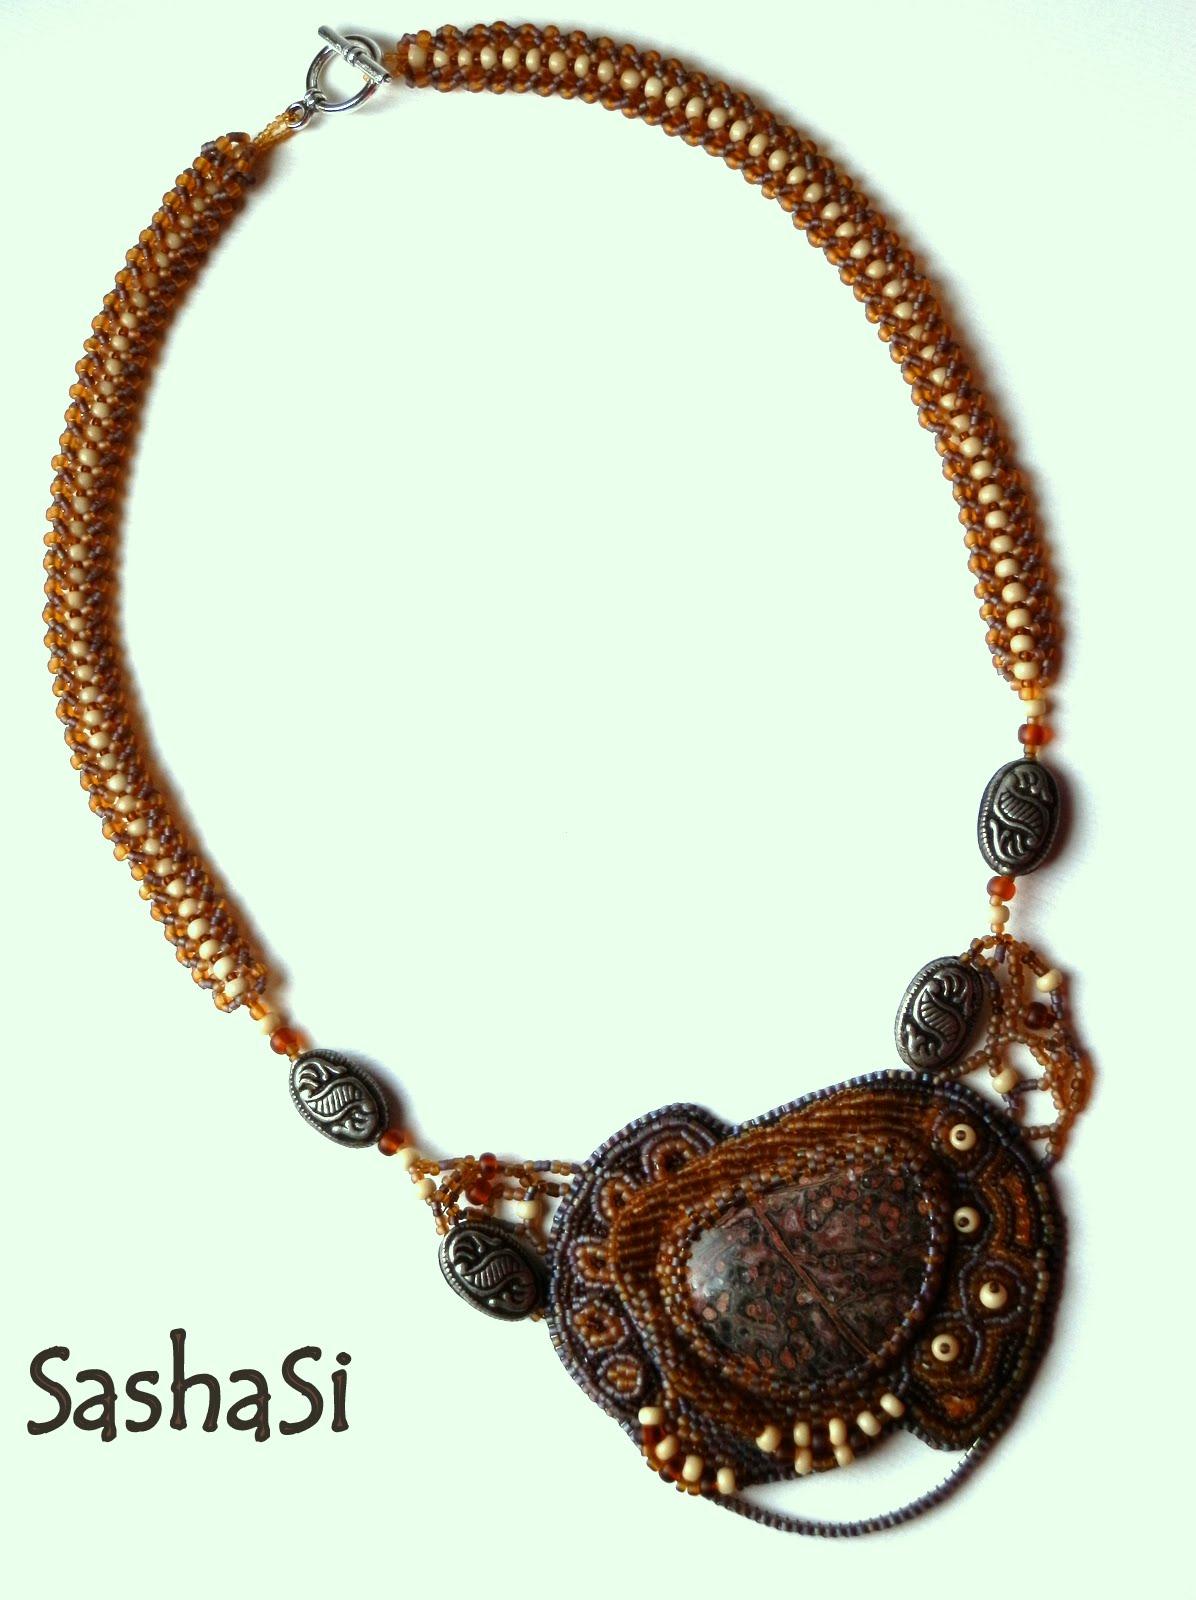 Bead embroidery shambala necklace sasha si